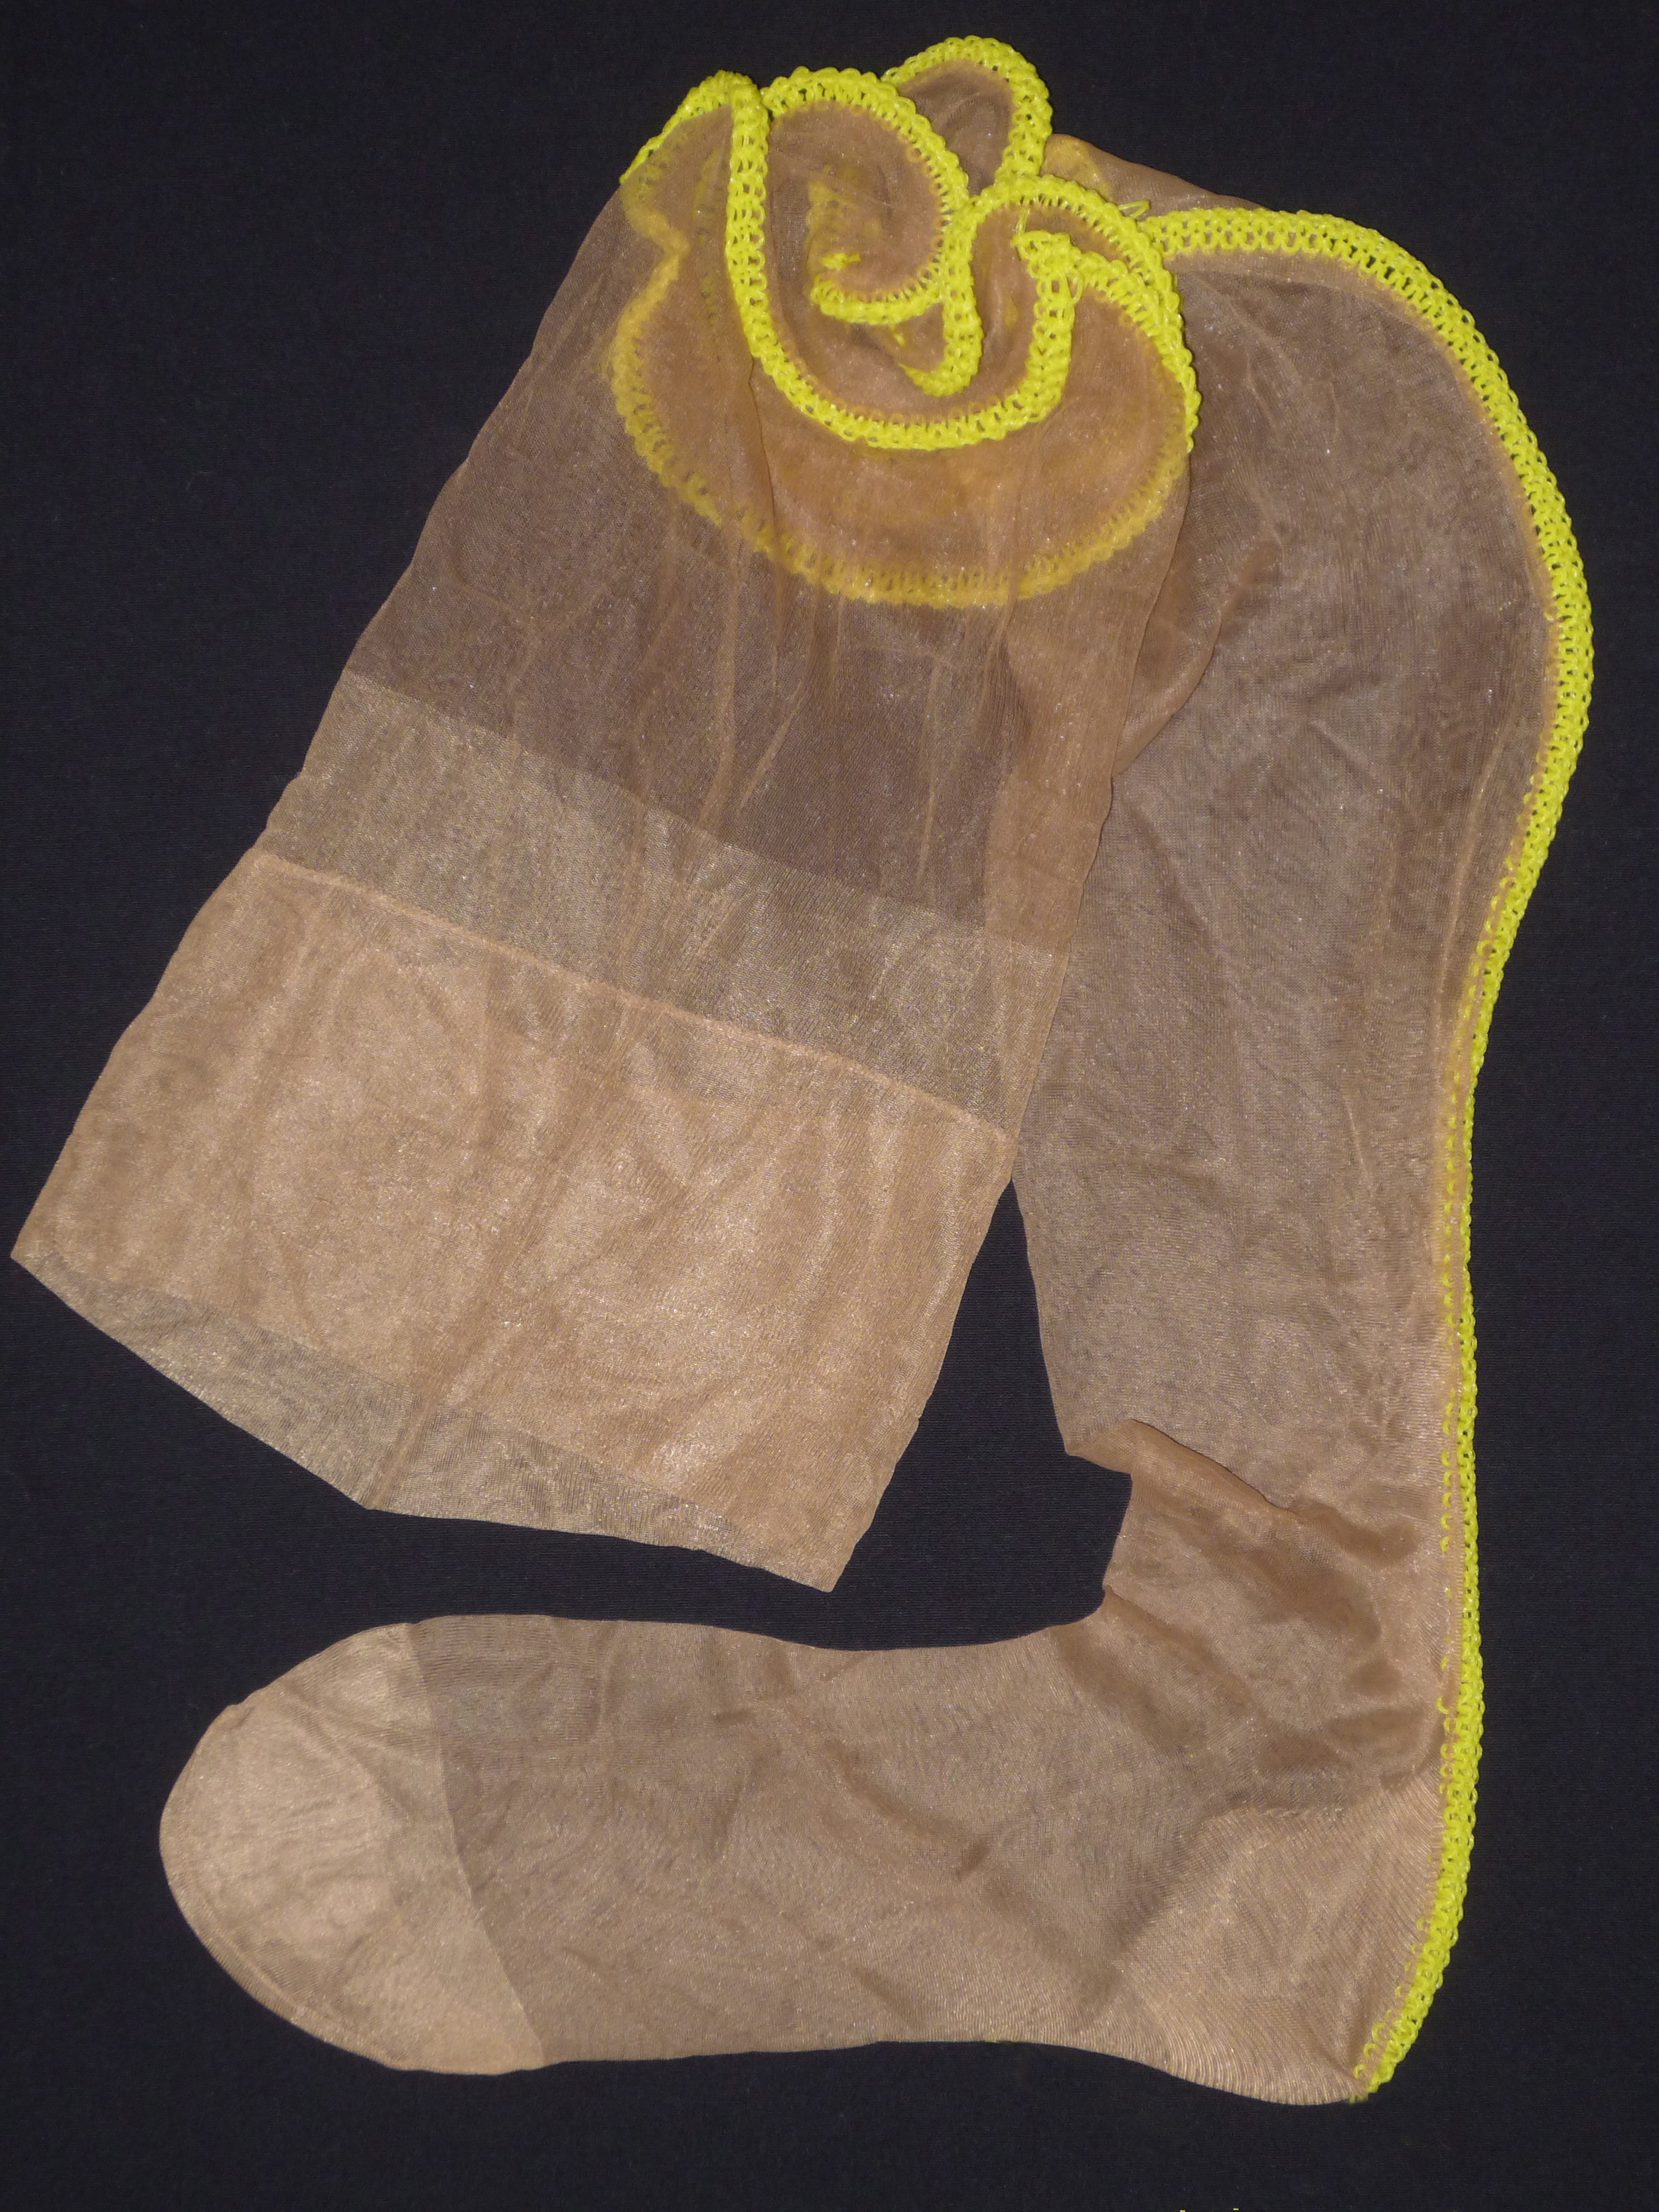 Fotografie, Digital Print auf Bütten, 29x20 cm, Nr.6